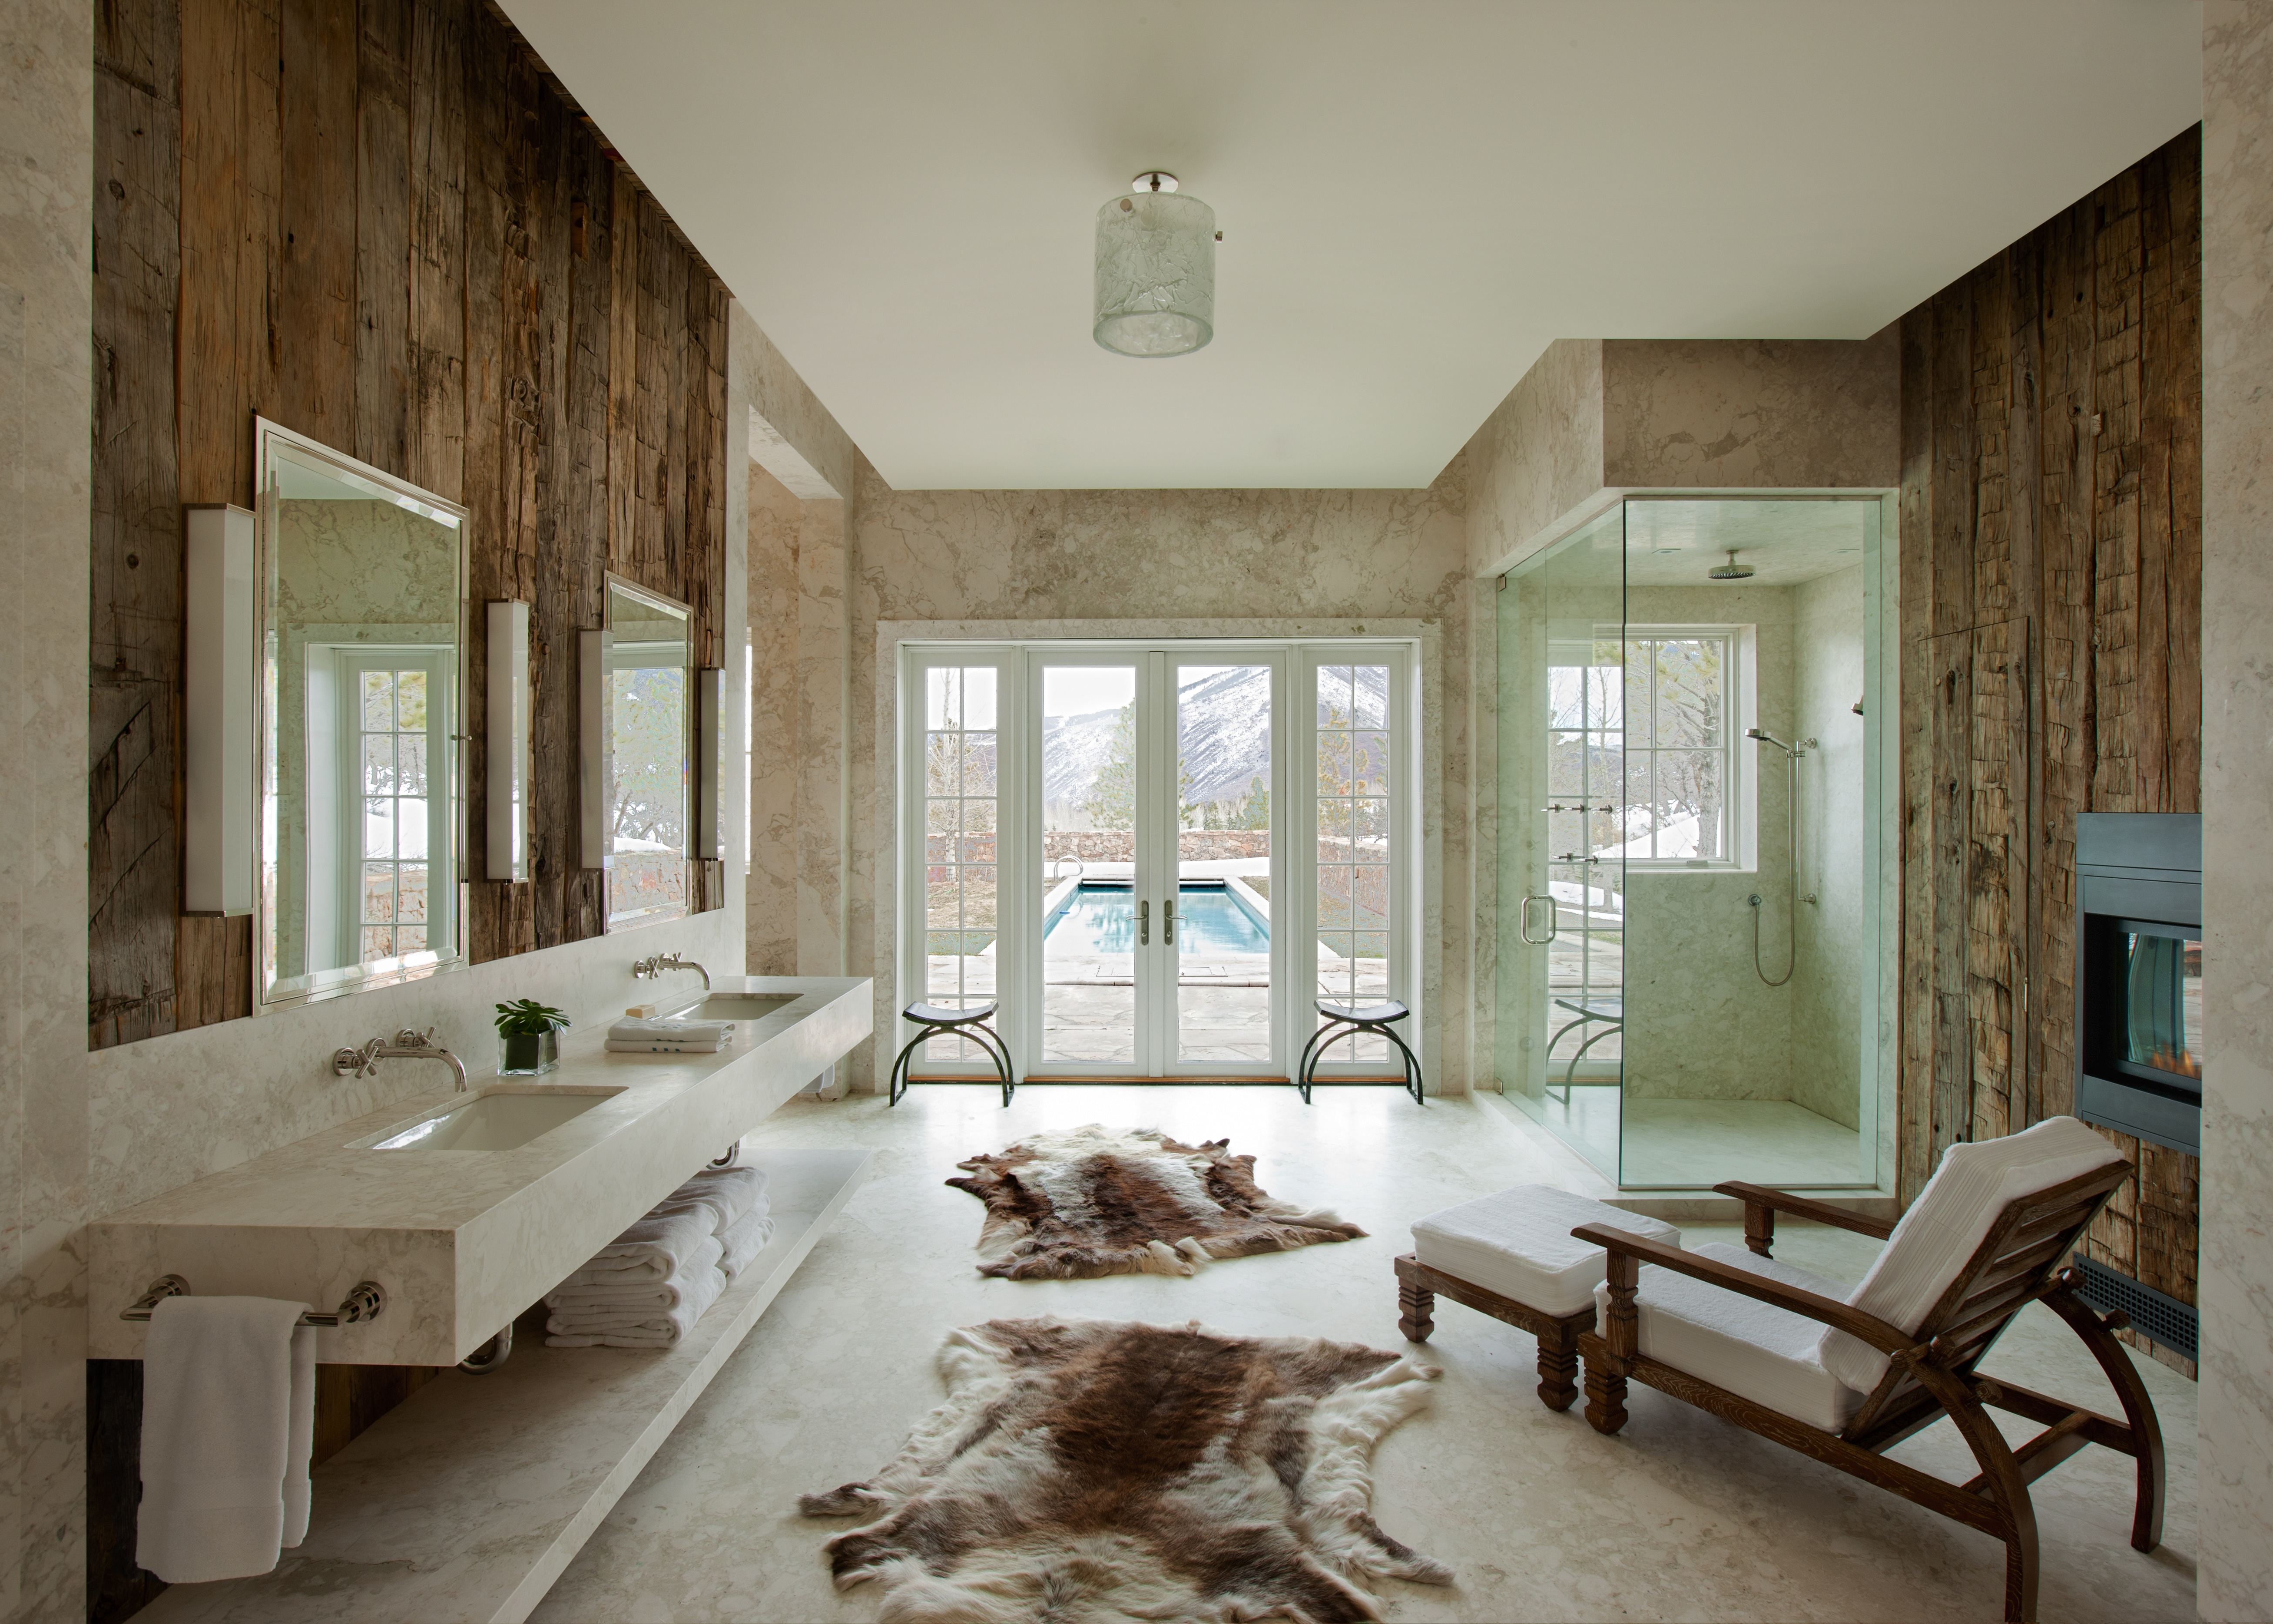 Interieur Rustic Moderne : Moderne badezimmer im vintage style freshouse